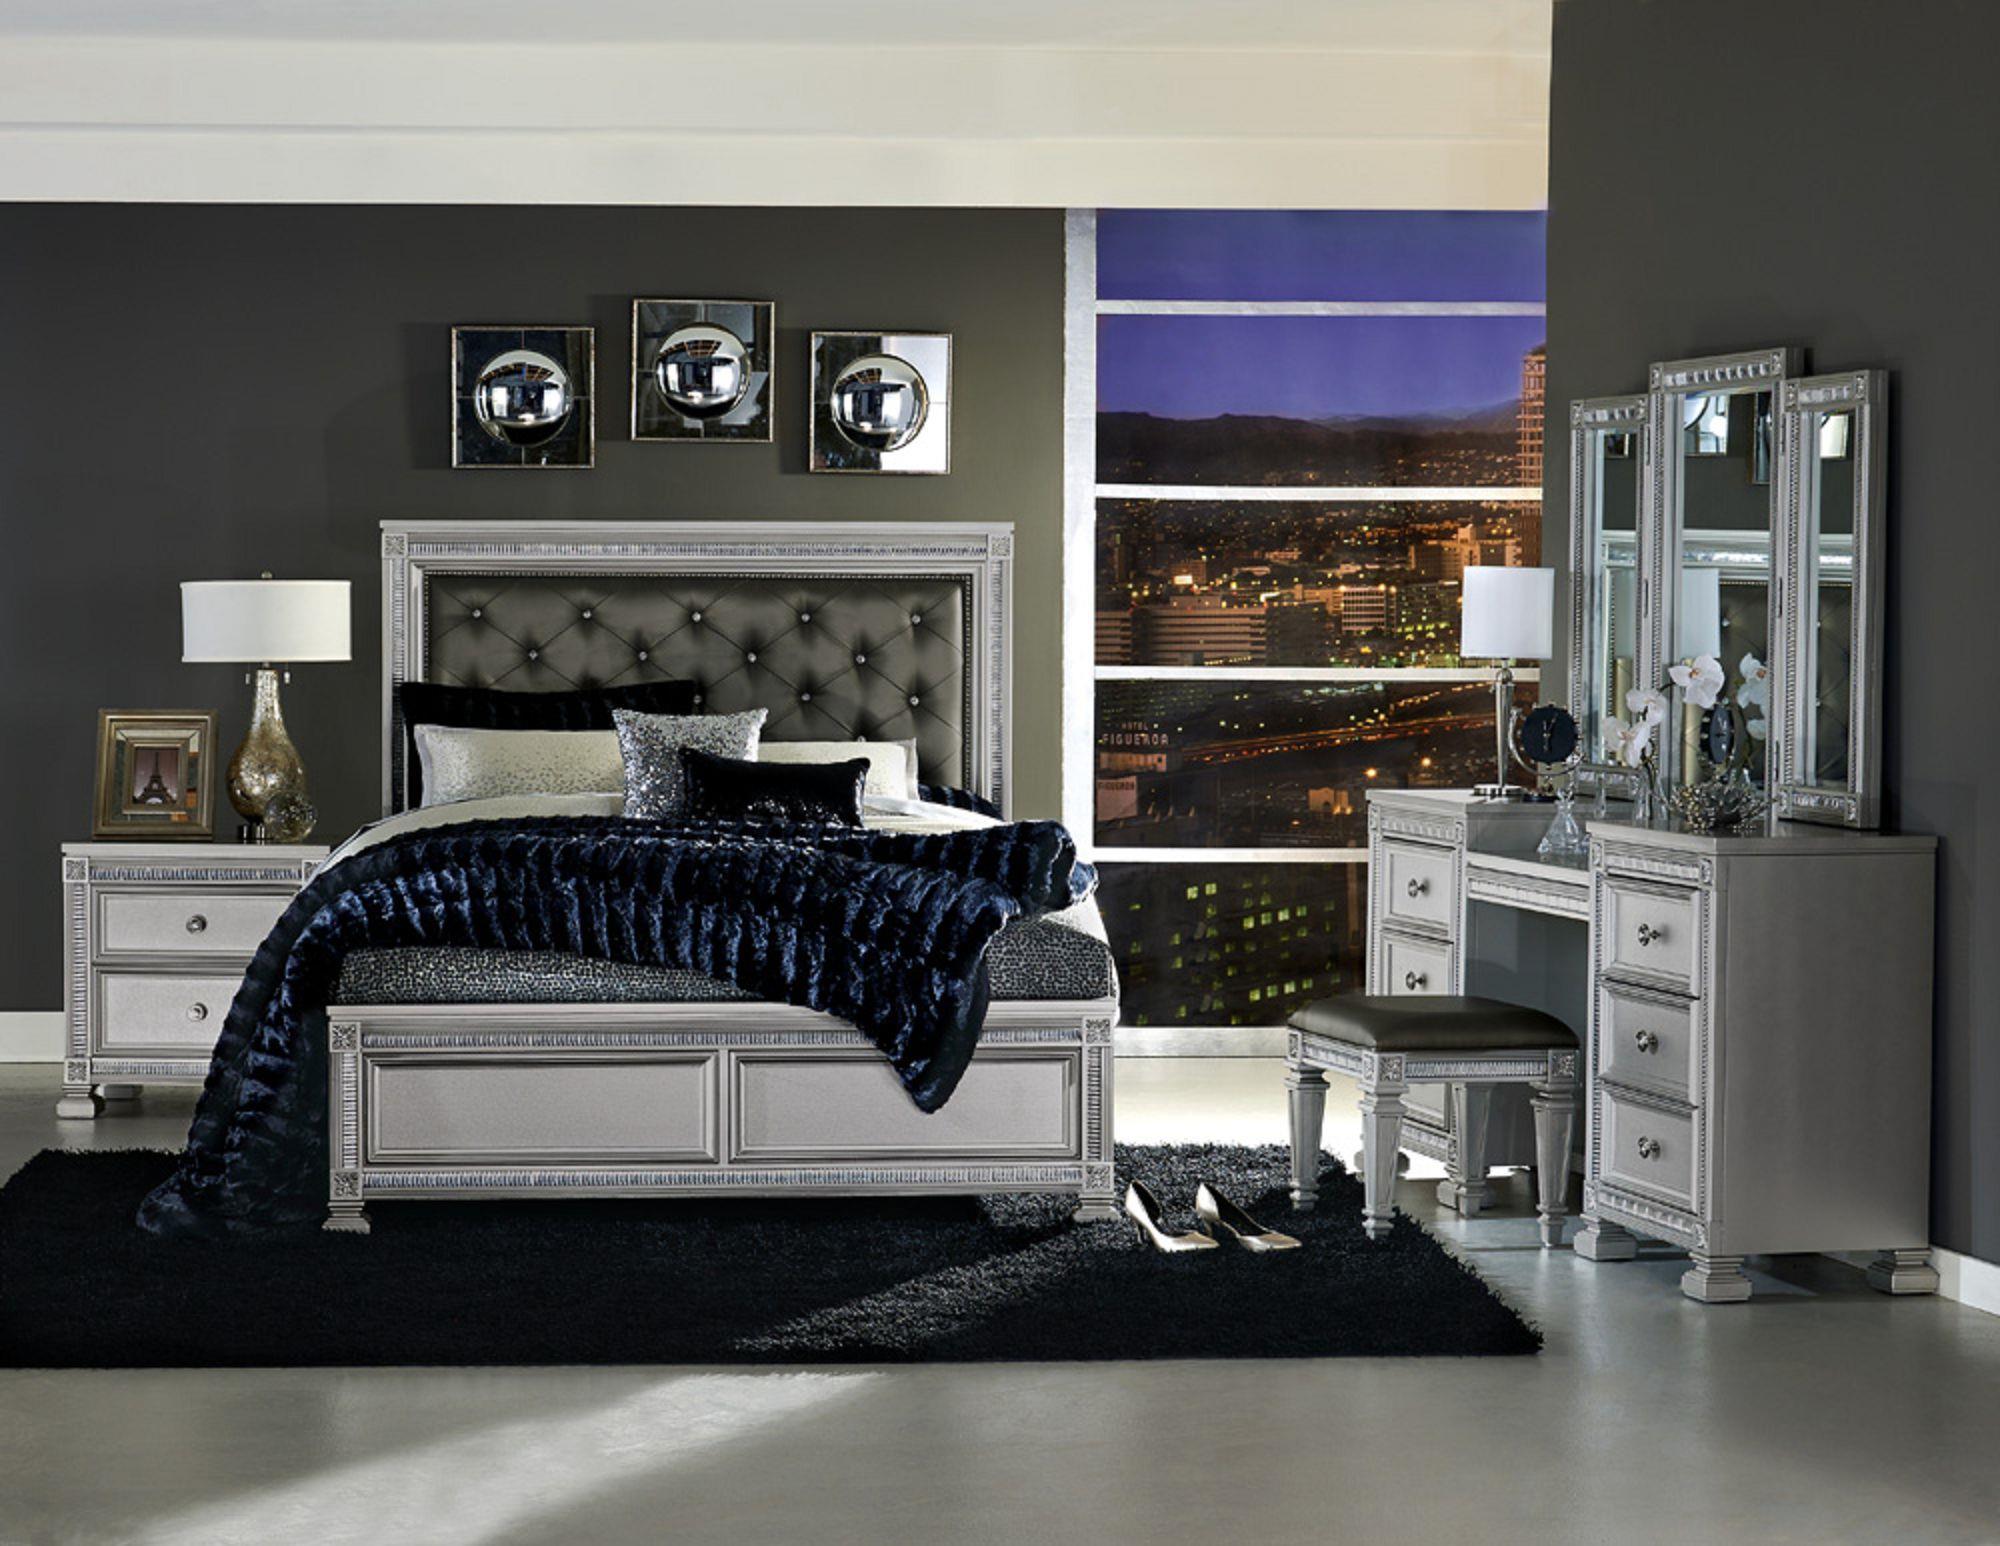 Bedroom Group 2